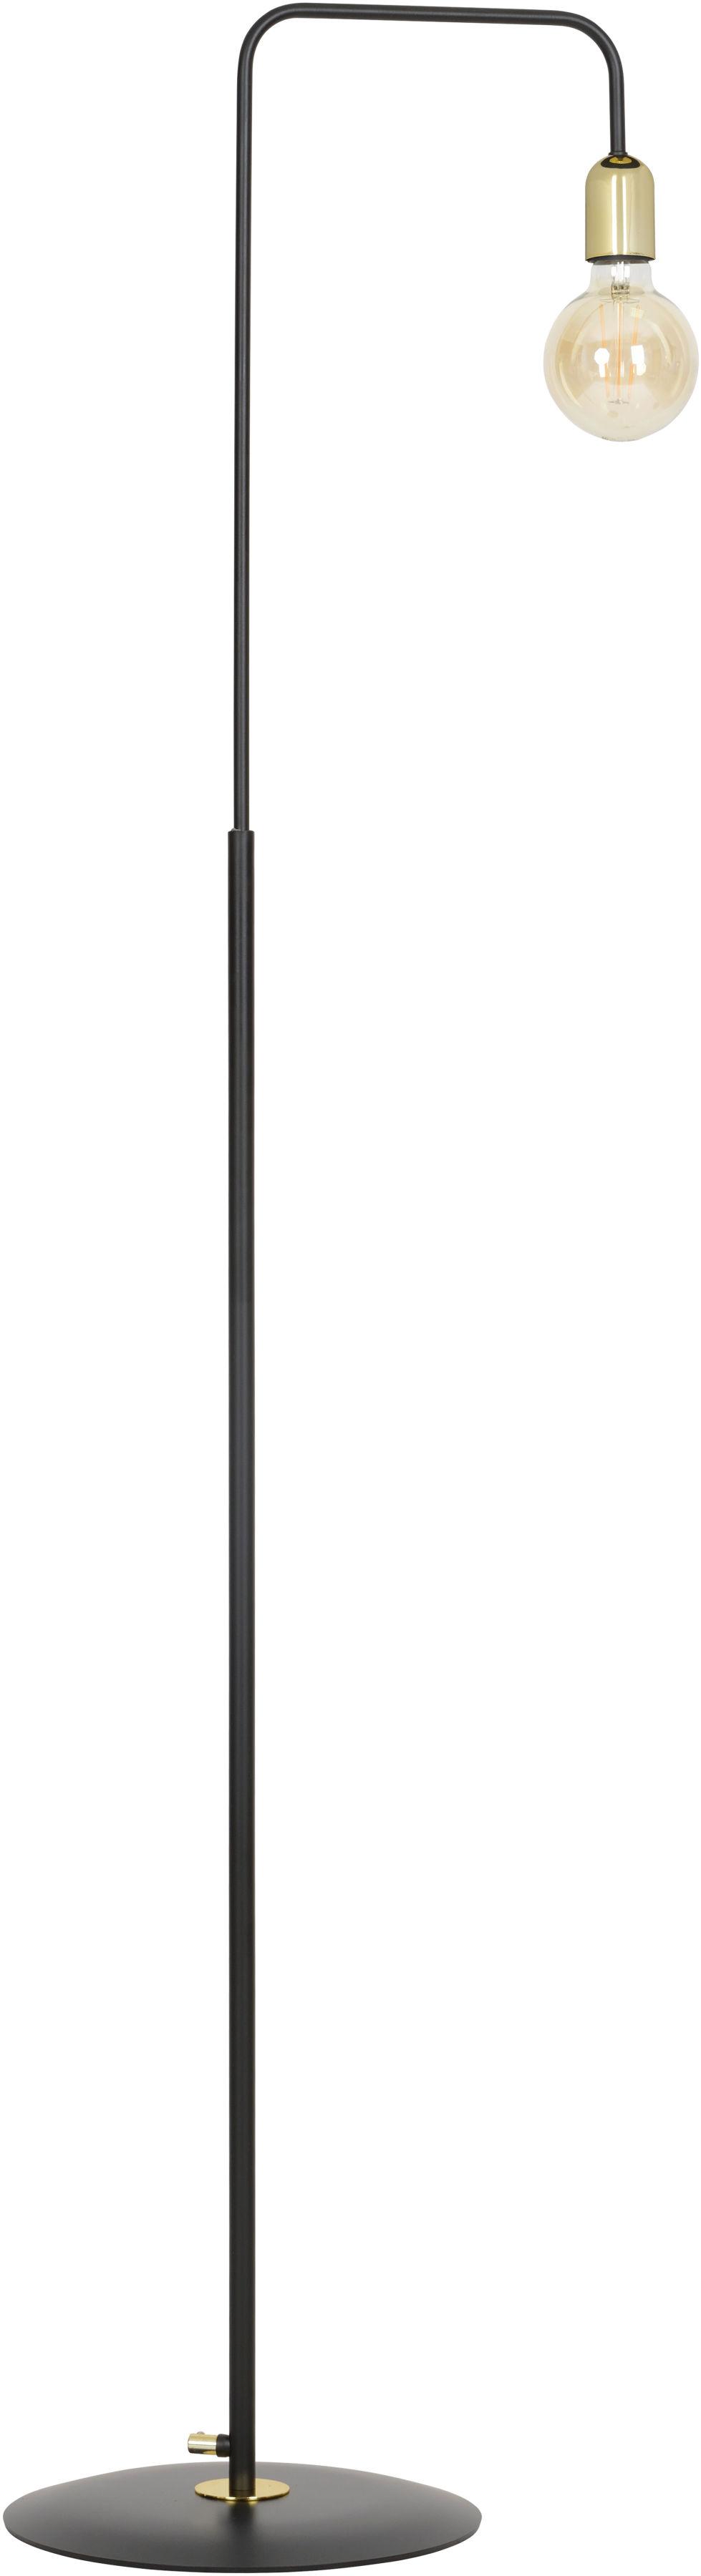 Emibig JUKA LP1 BLACK 580/LP1 lampa podłogowa czarno złota metal loftowa 1x60W E27 150cm